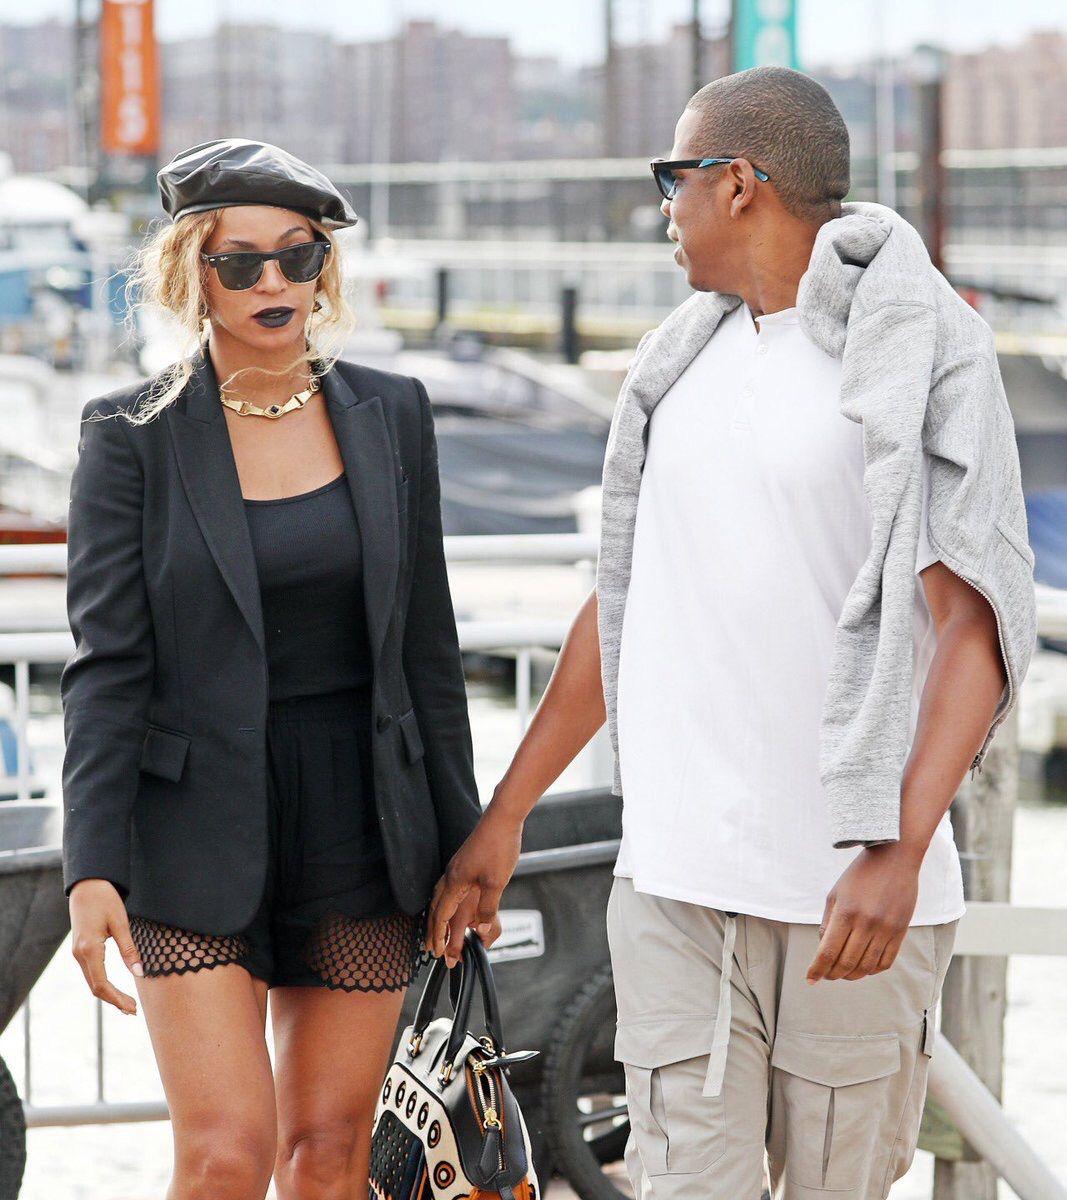 fe7e644ca66e Beyoncé   Jay Z in New York on June 13th